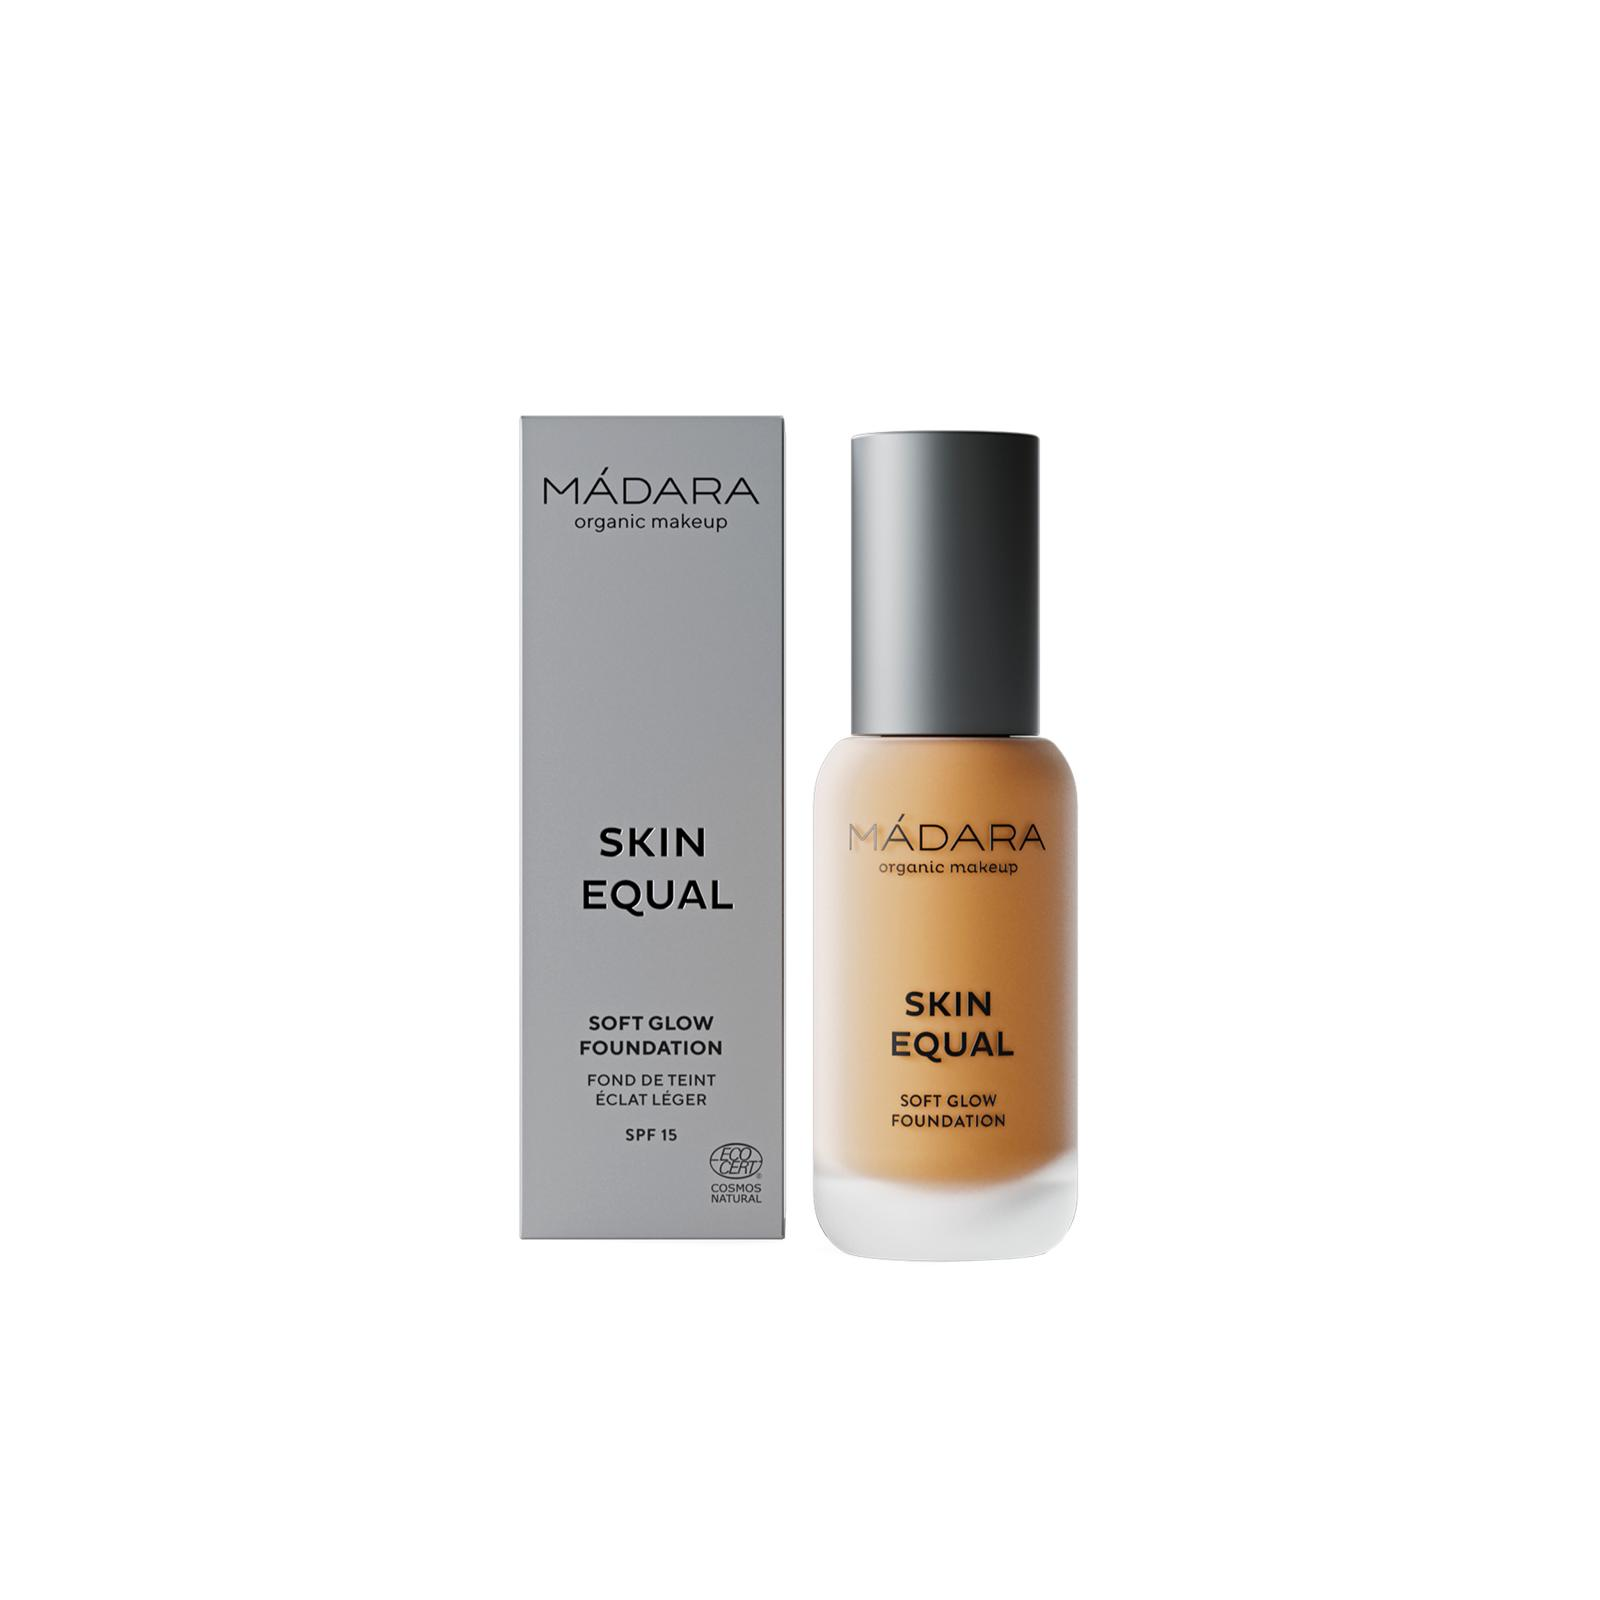 MÁDARA Make-up s SPF 15, Olive 60 30 ml